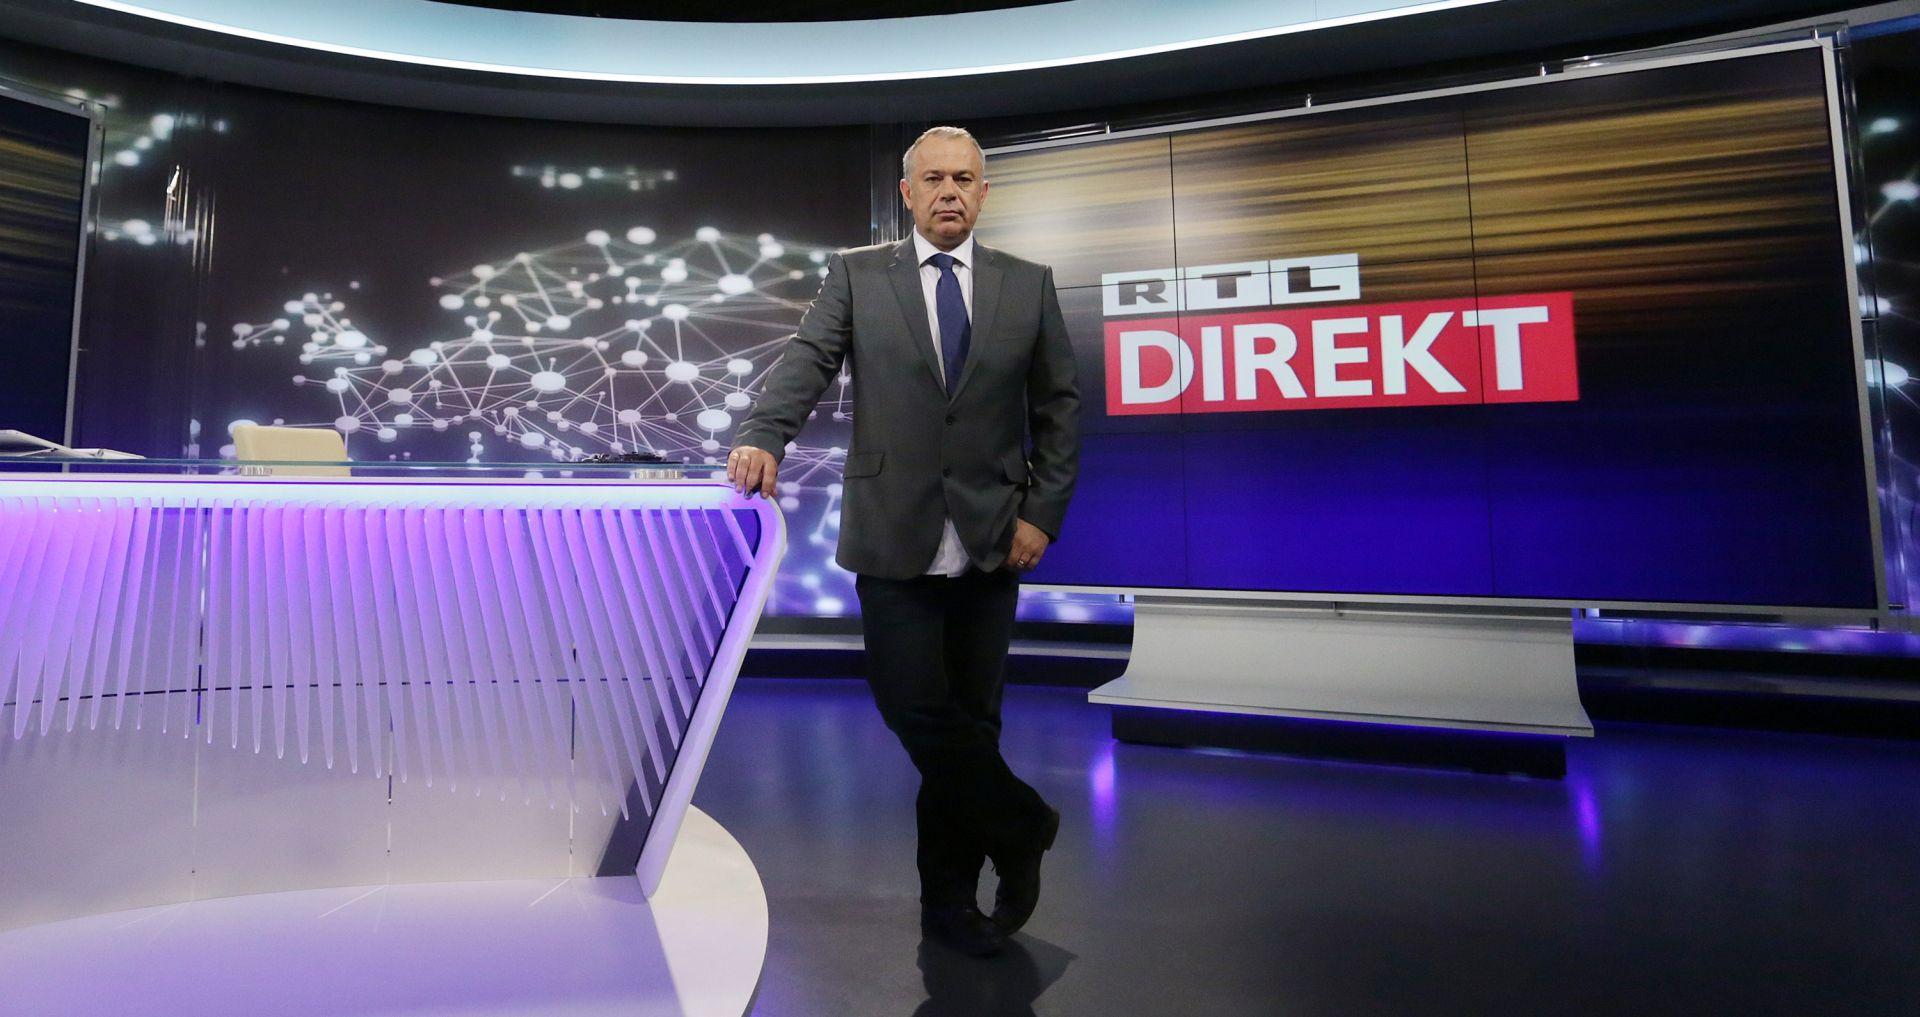 WEEKEND MEDIA FESTIVAL Šprajc treći put najbolji novinar